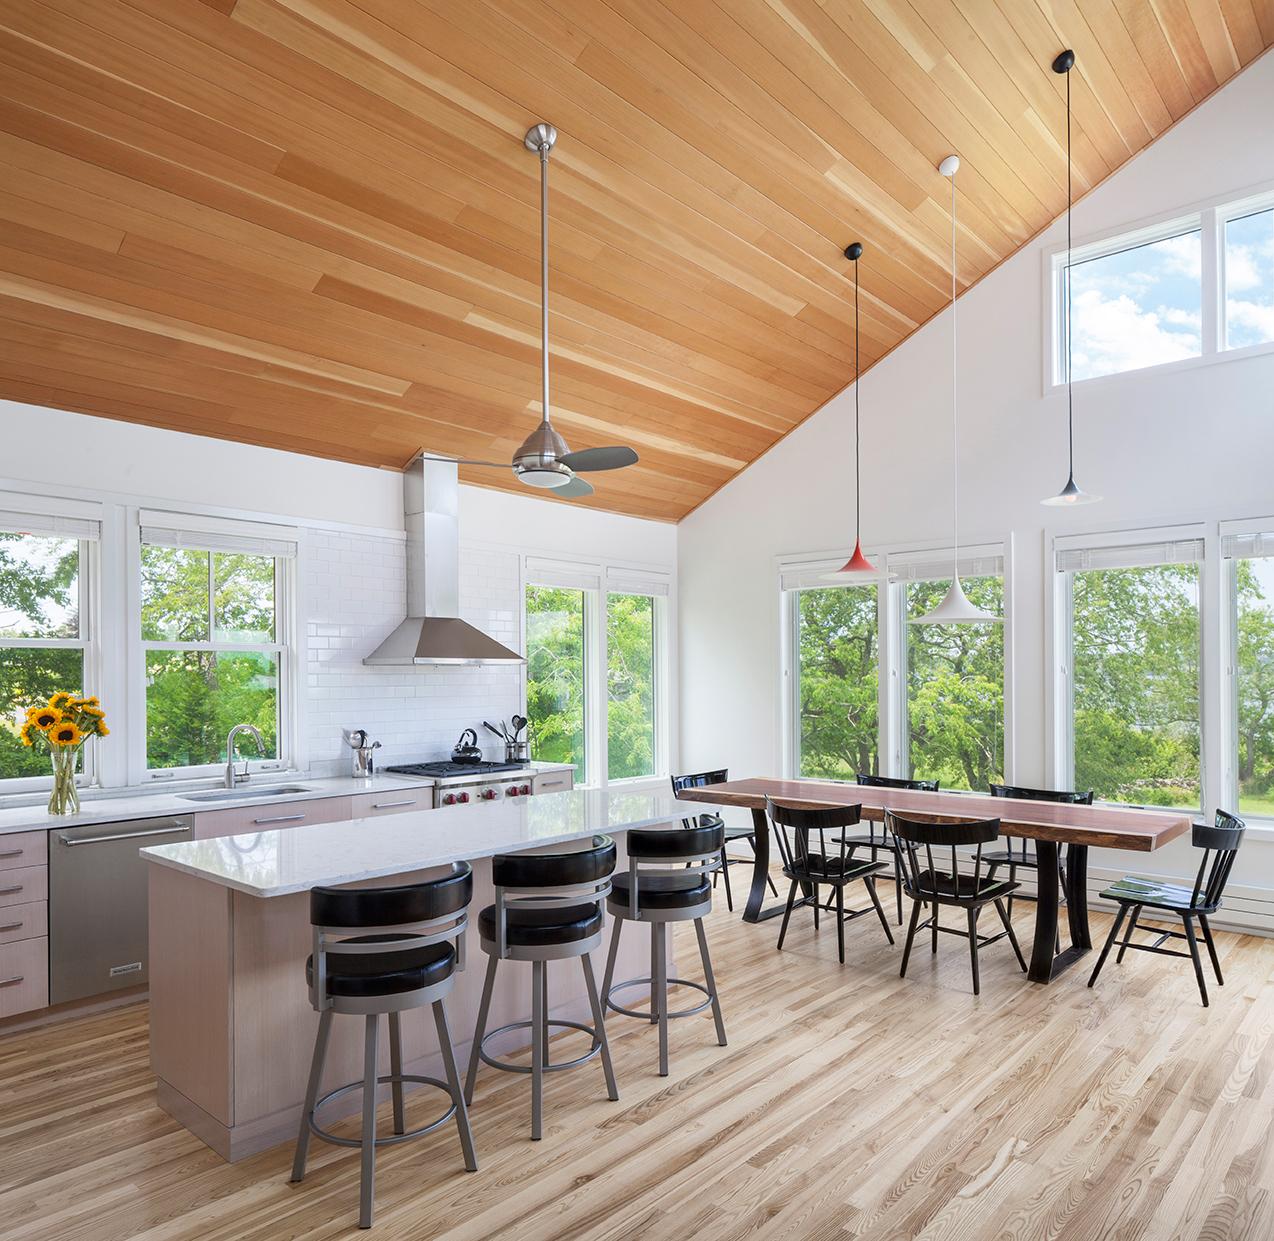 Rhode Island Retreat, in Collaboration with Glen S. Fontecchio Architects